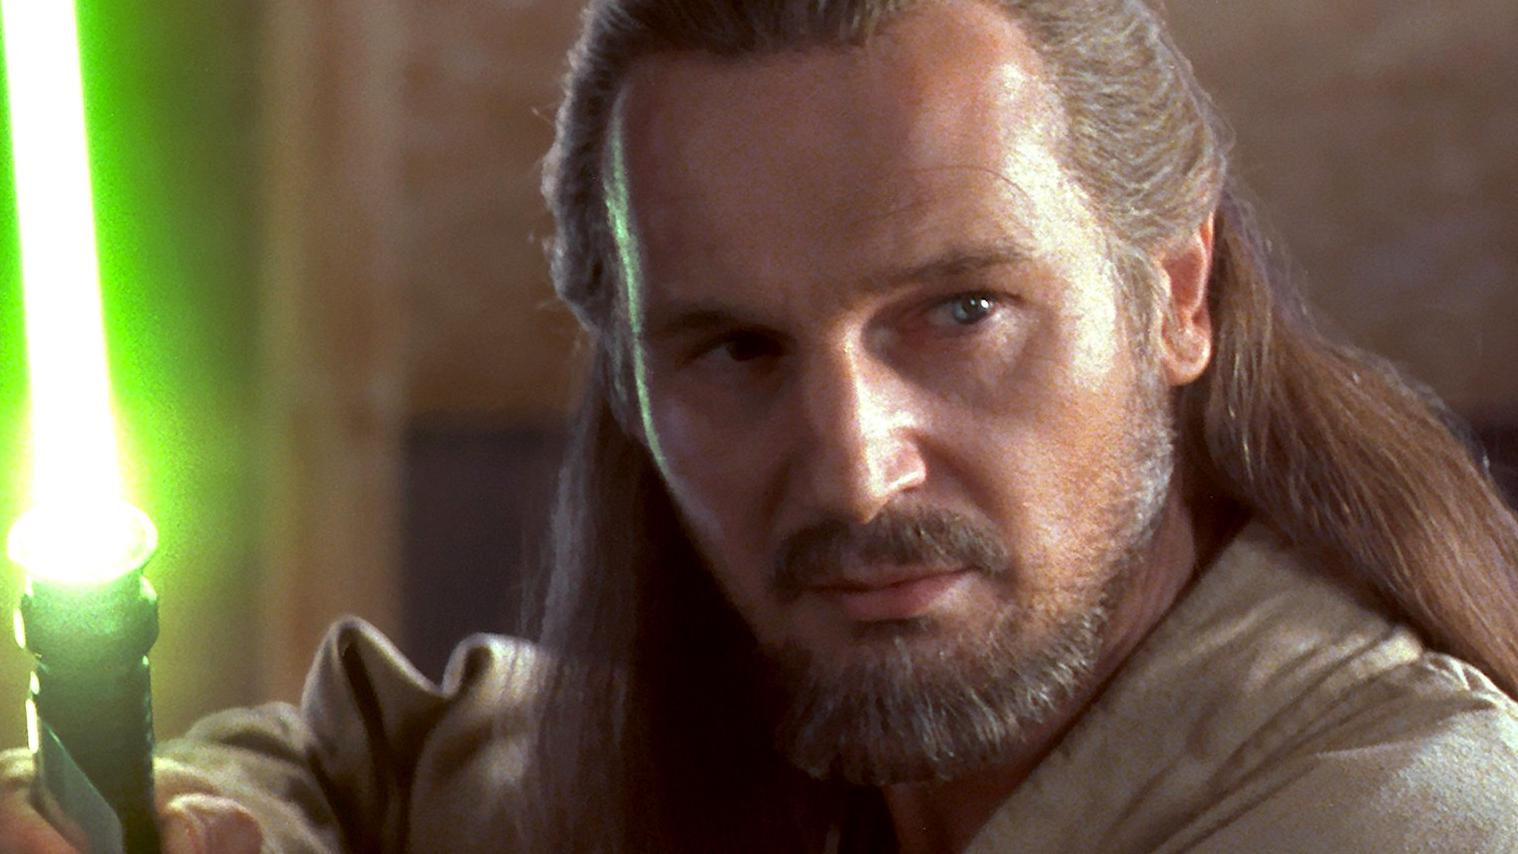 Exclusive: Liam Neeson Will Star In A Qui-Gon Jinn Series For Disney+